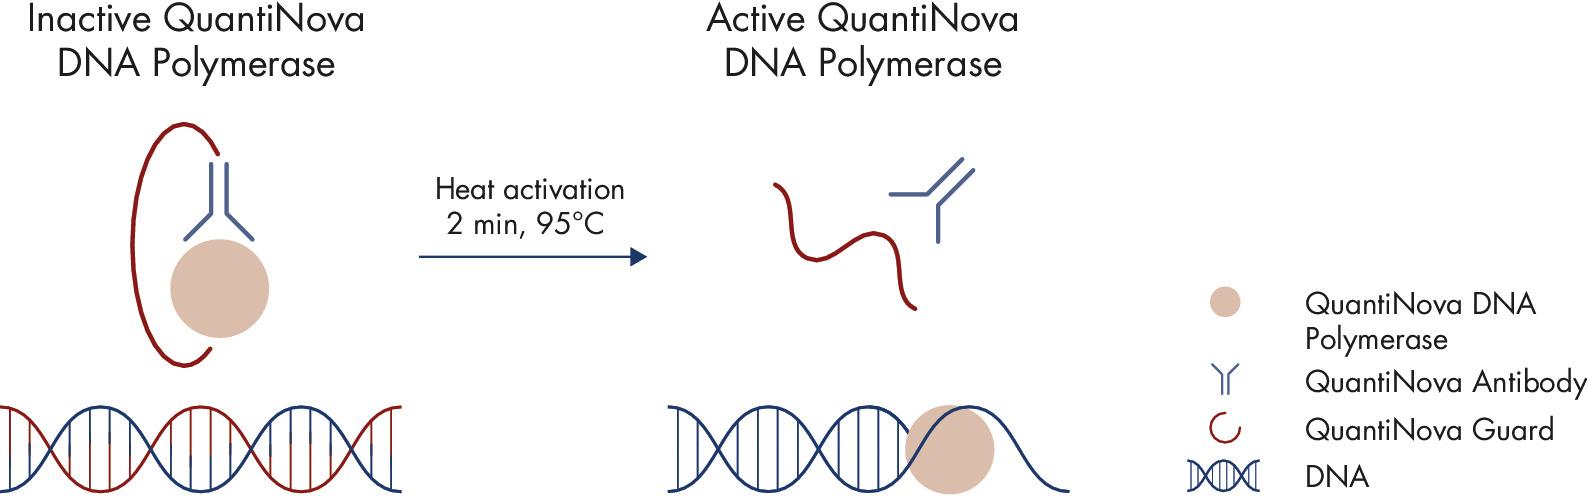 Principle of the novel QuantiNova hot-start mechanism.